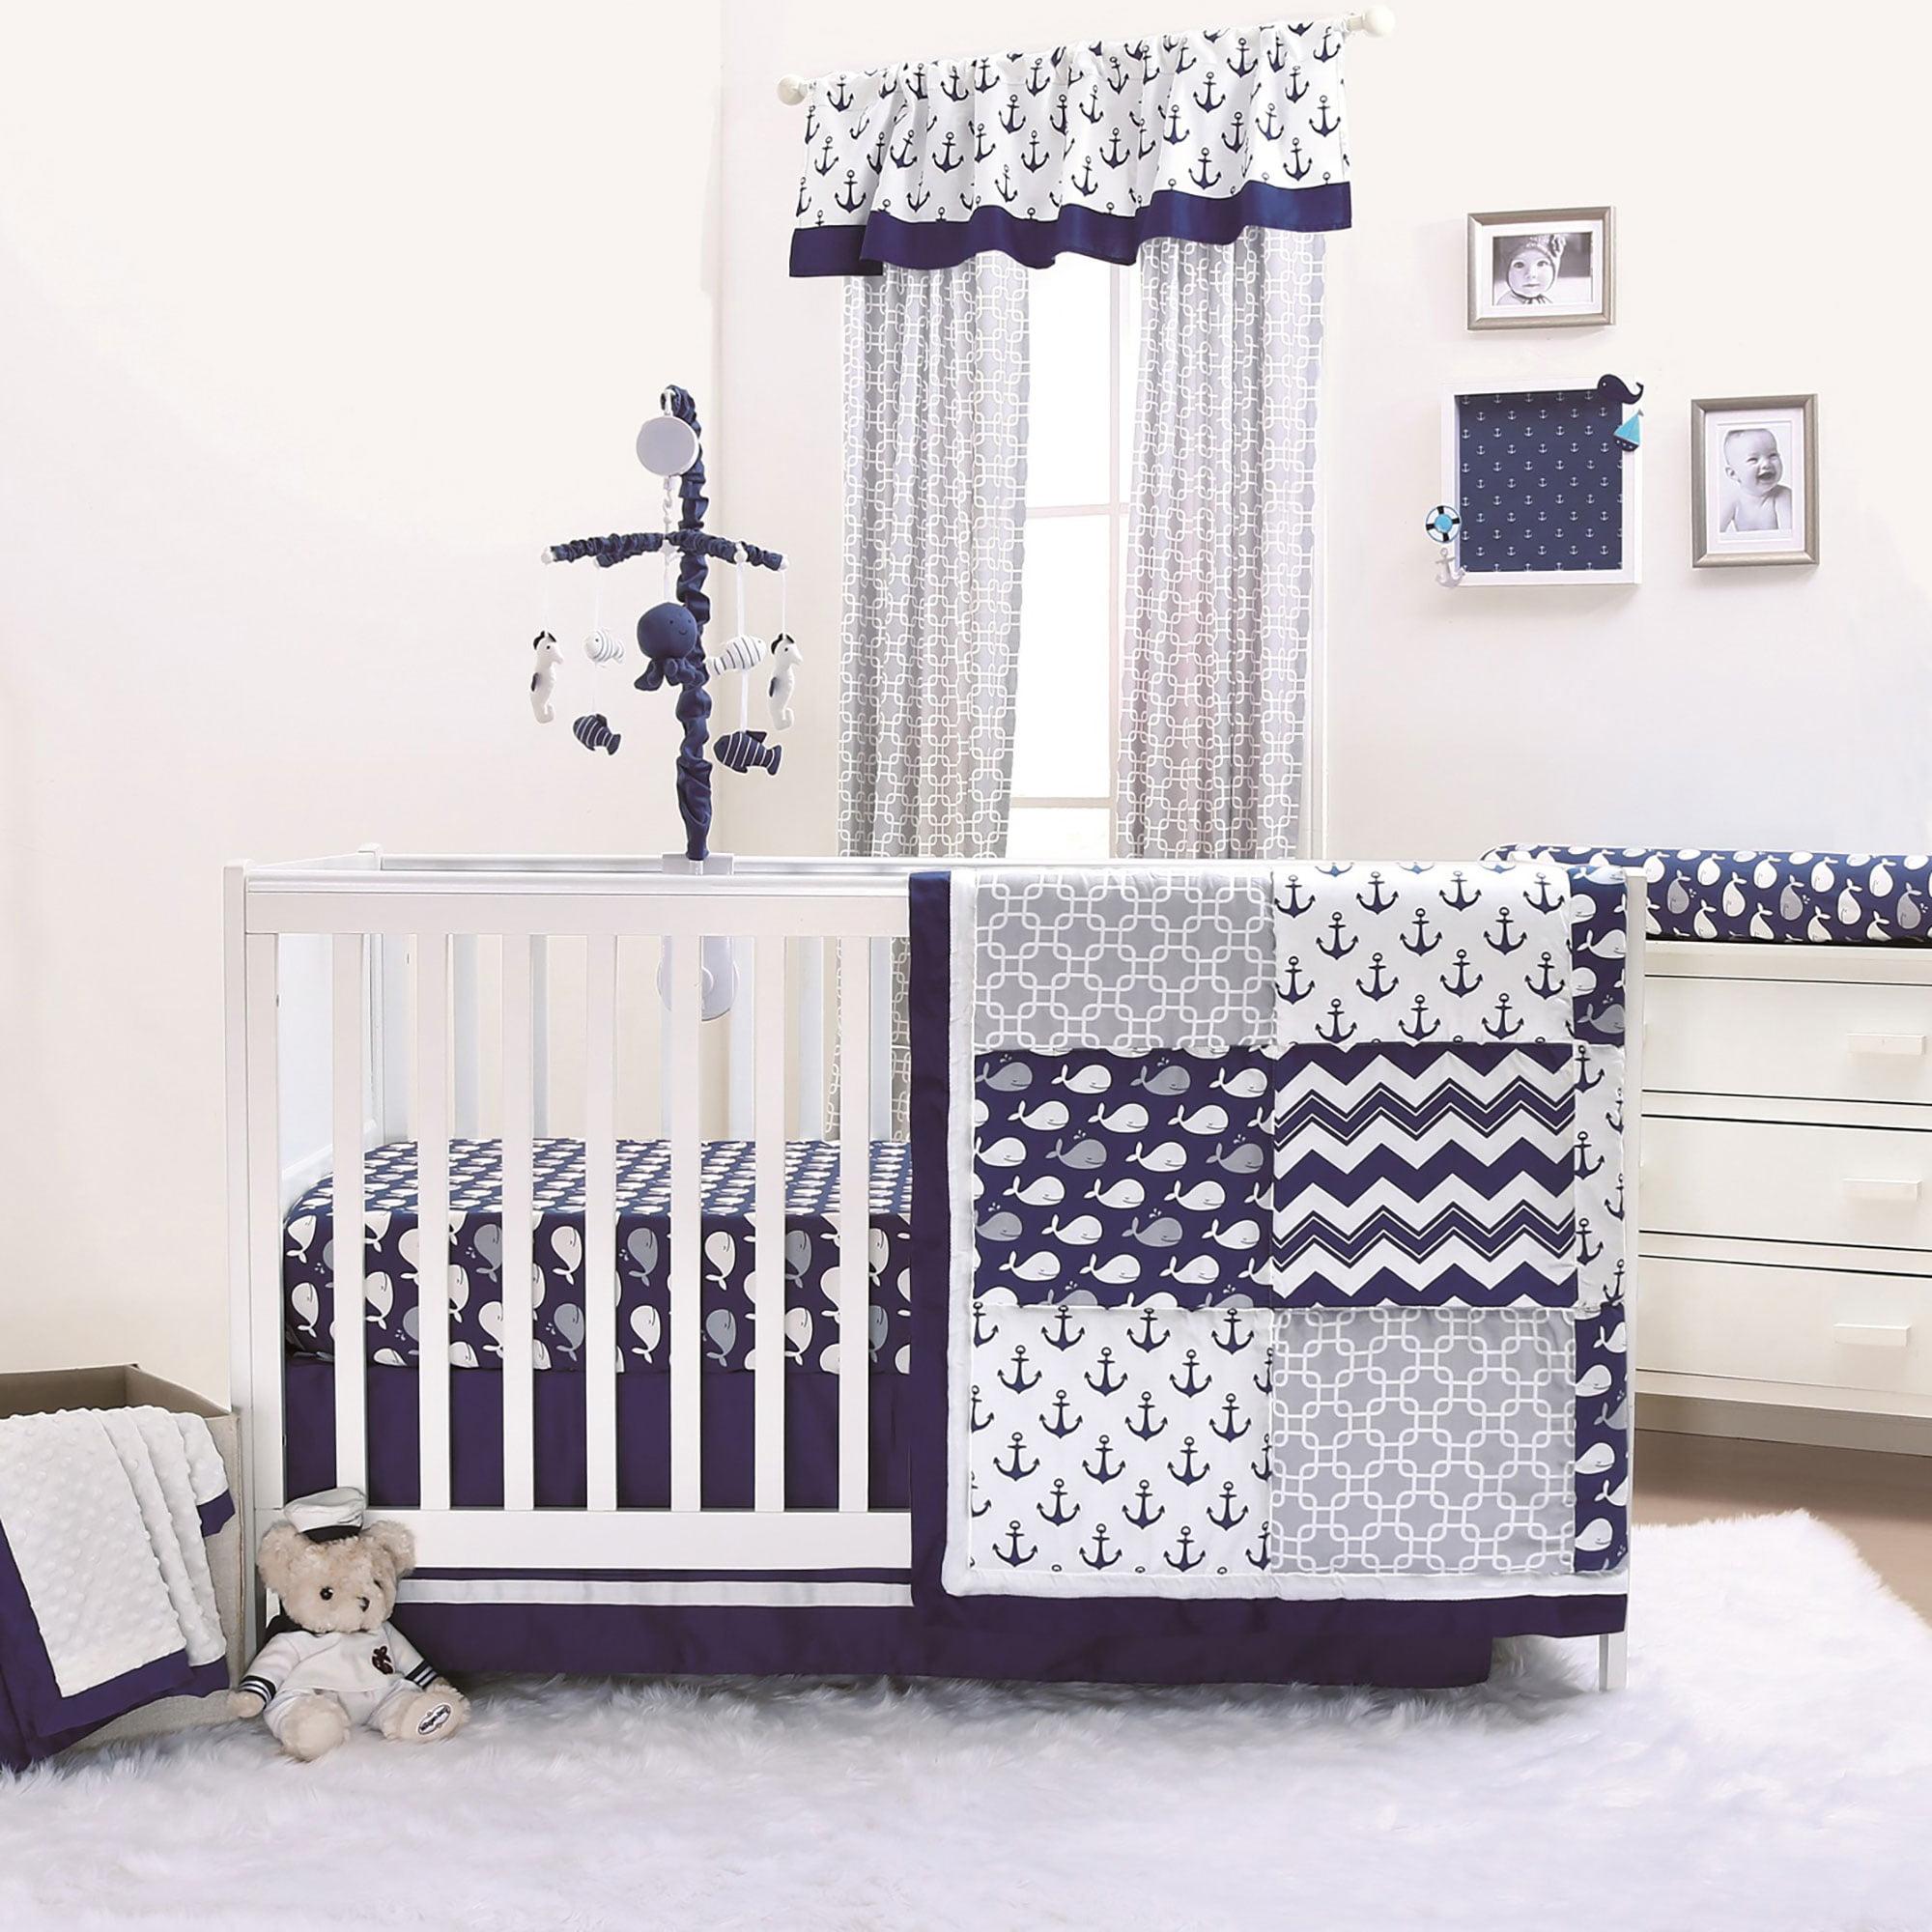 Incroyable Navy Whale Blue Nautical Baby Crib Bedding   11 Piece Sleep Essentials Set    Walmart.com